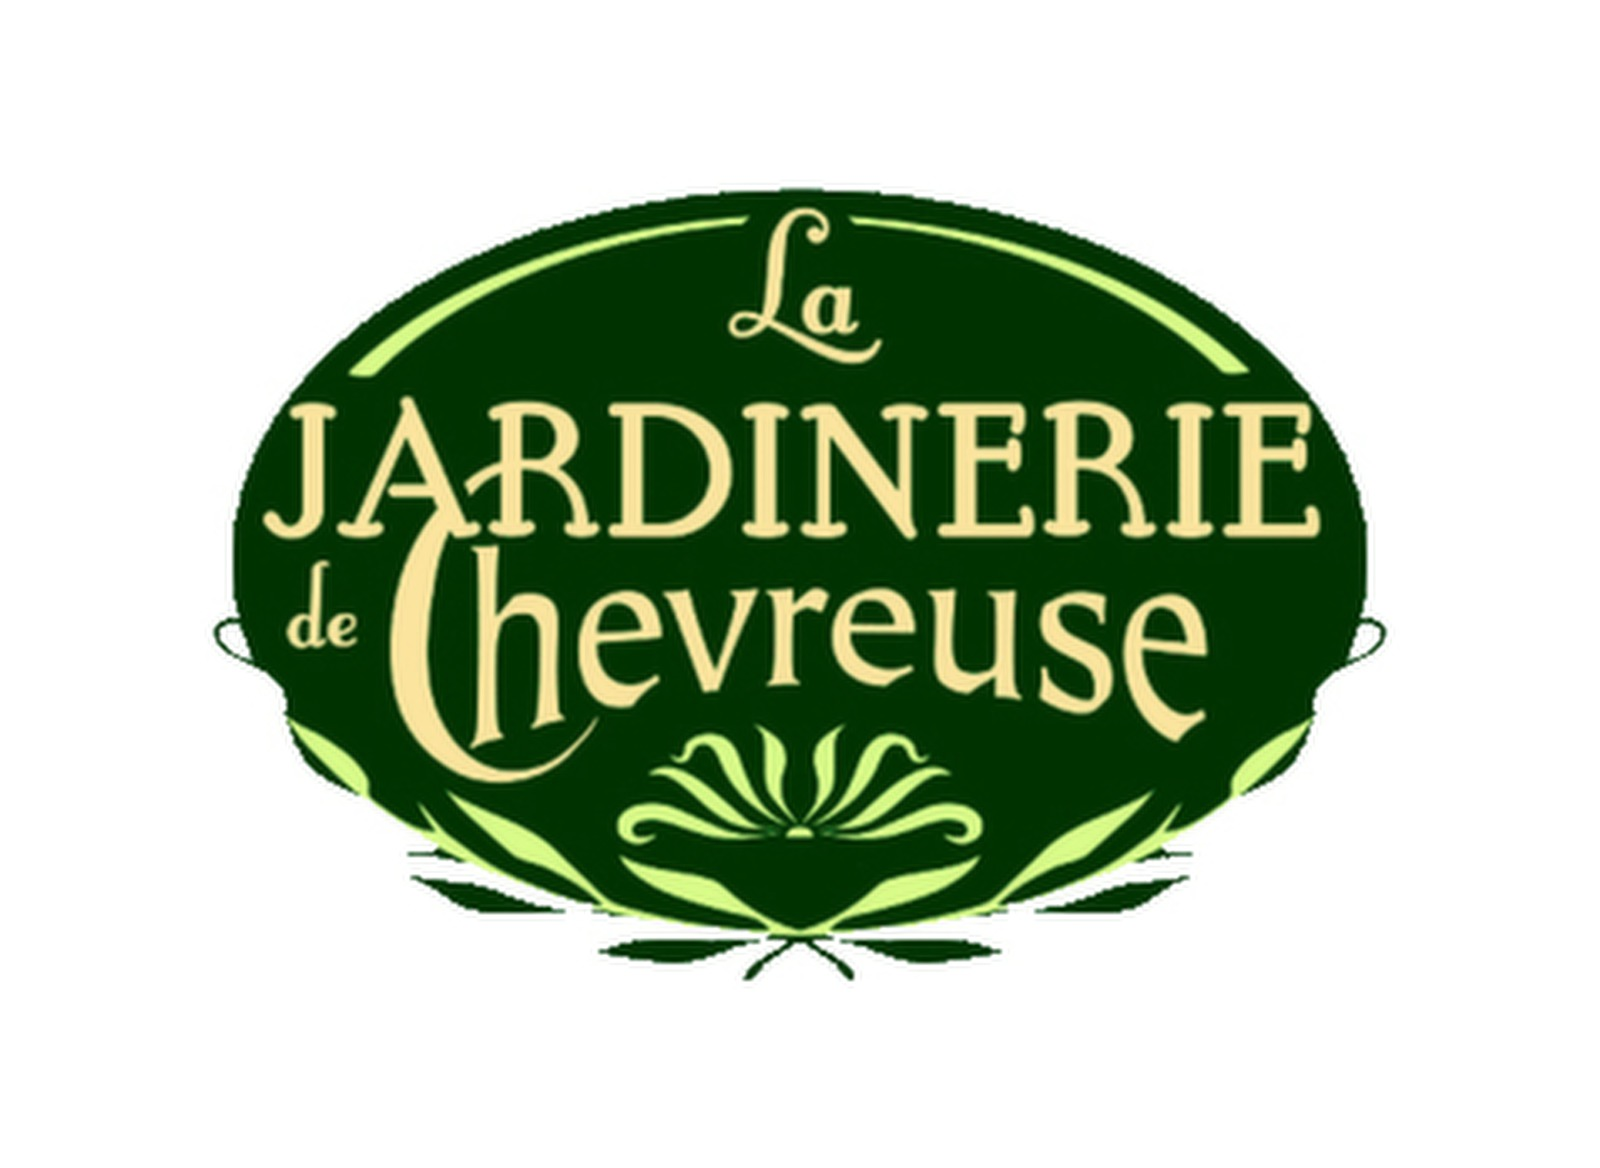 Jardinerie à Chevreuse (78 460), Yvelines